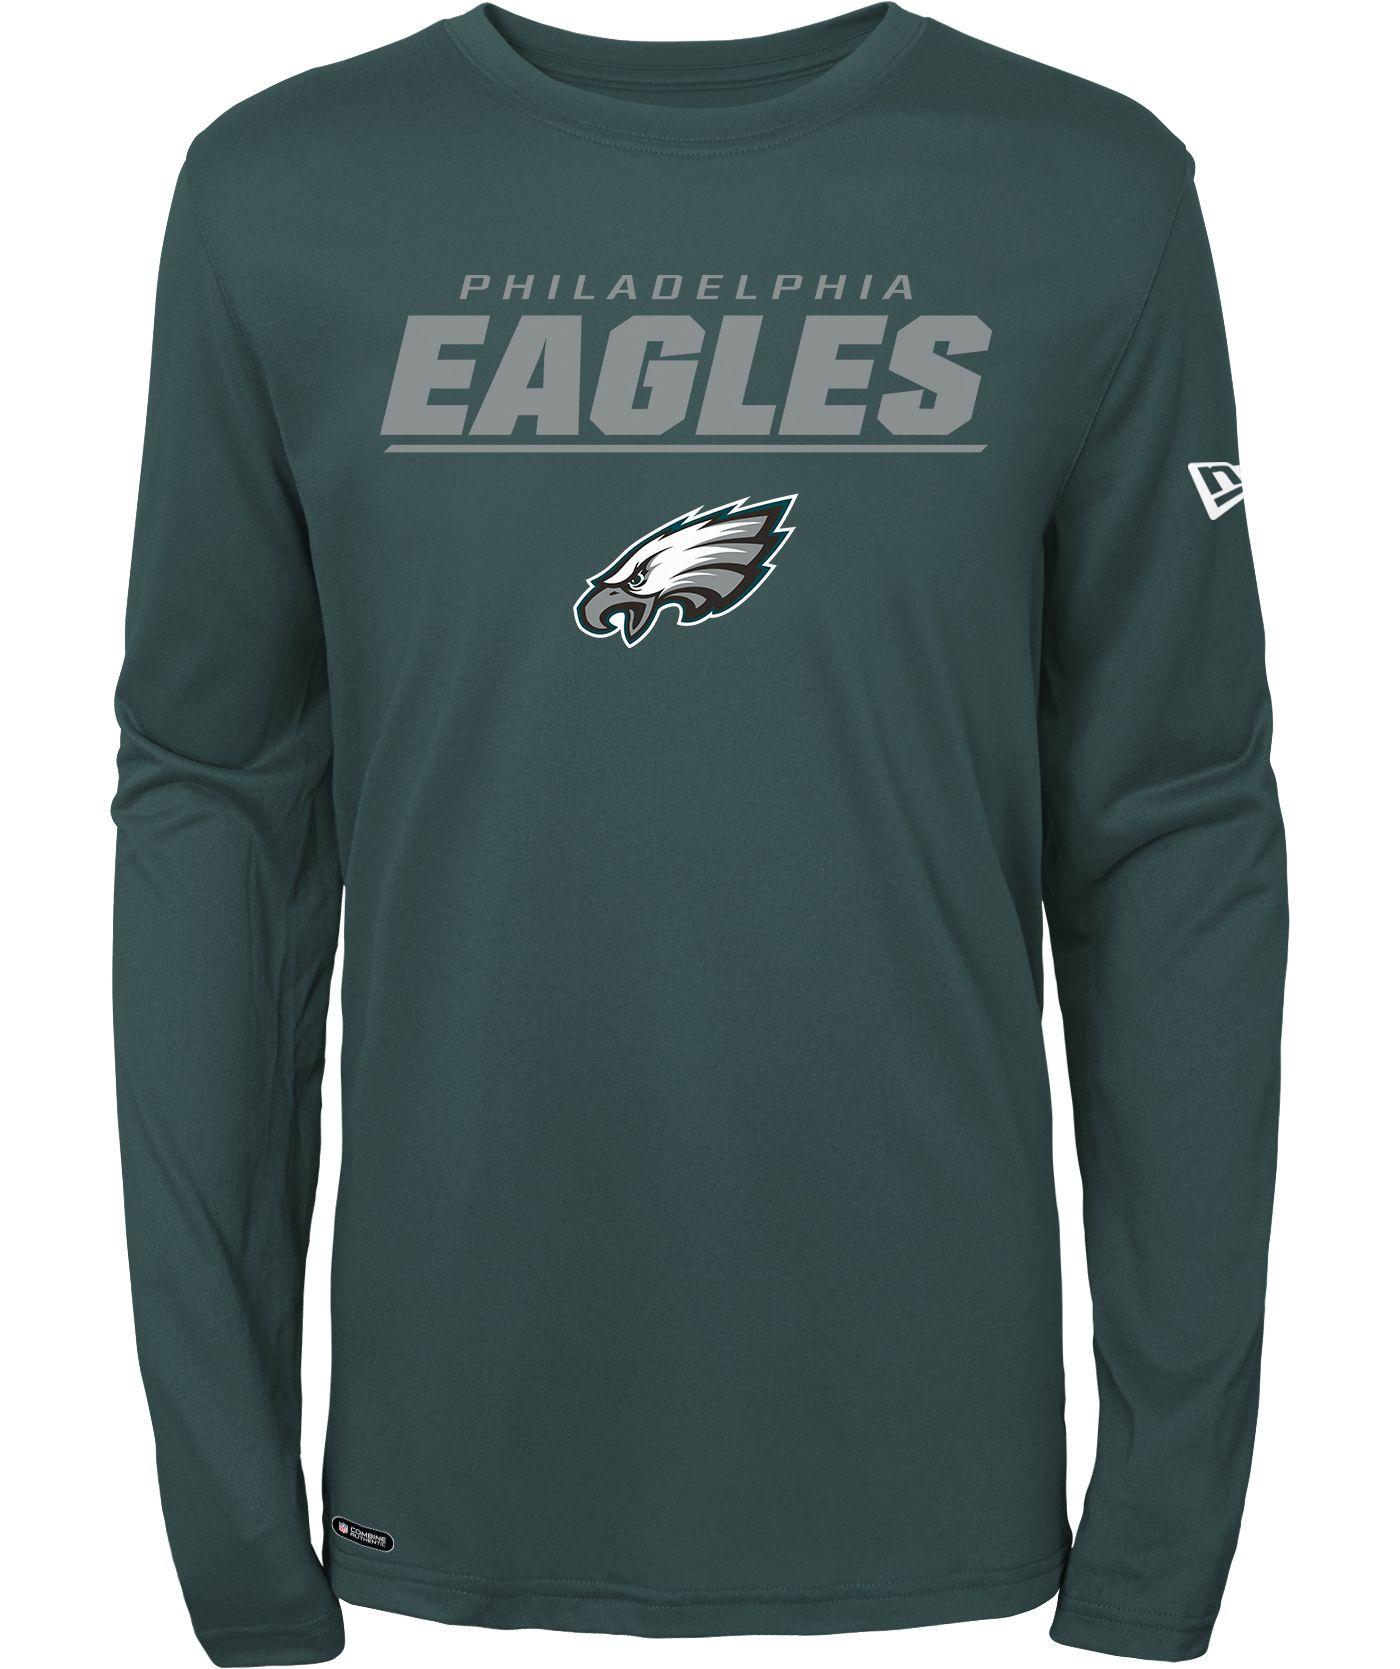 New Era Men's Philadelphia Eagles Combine Green Polyester Long Sleeve Shirt